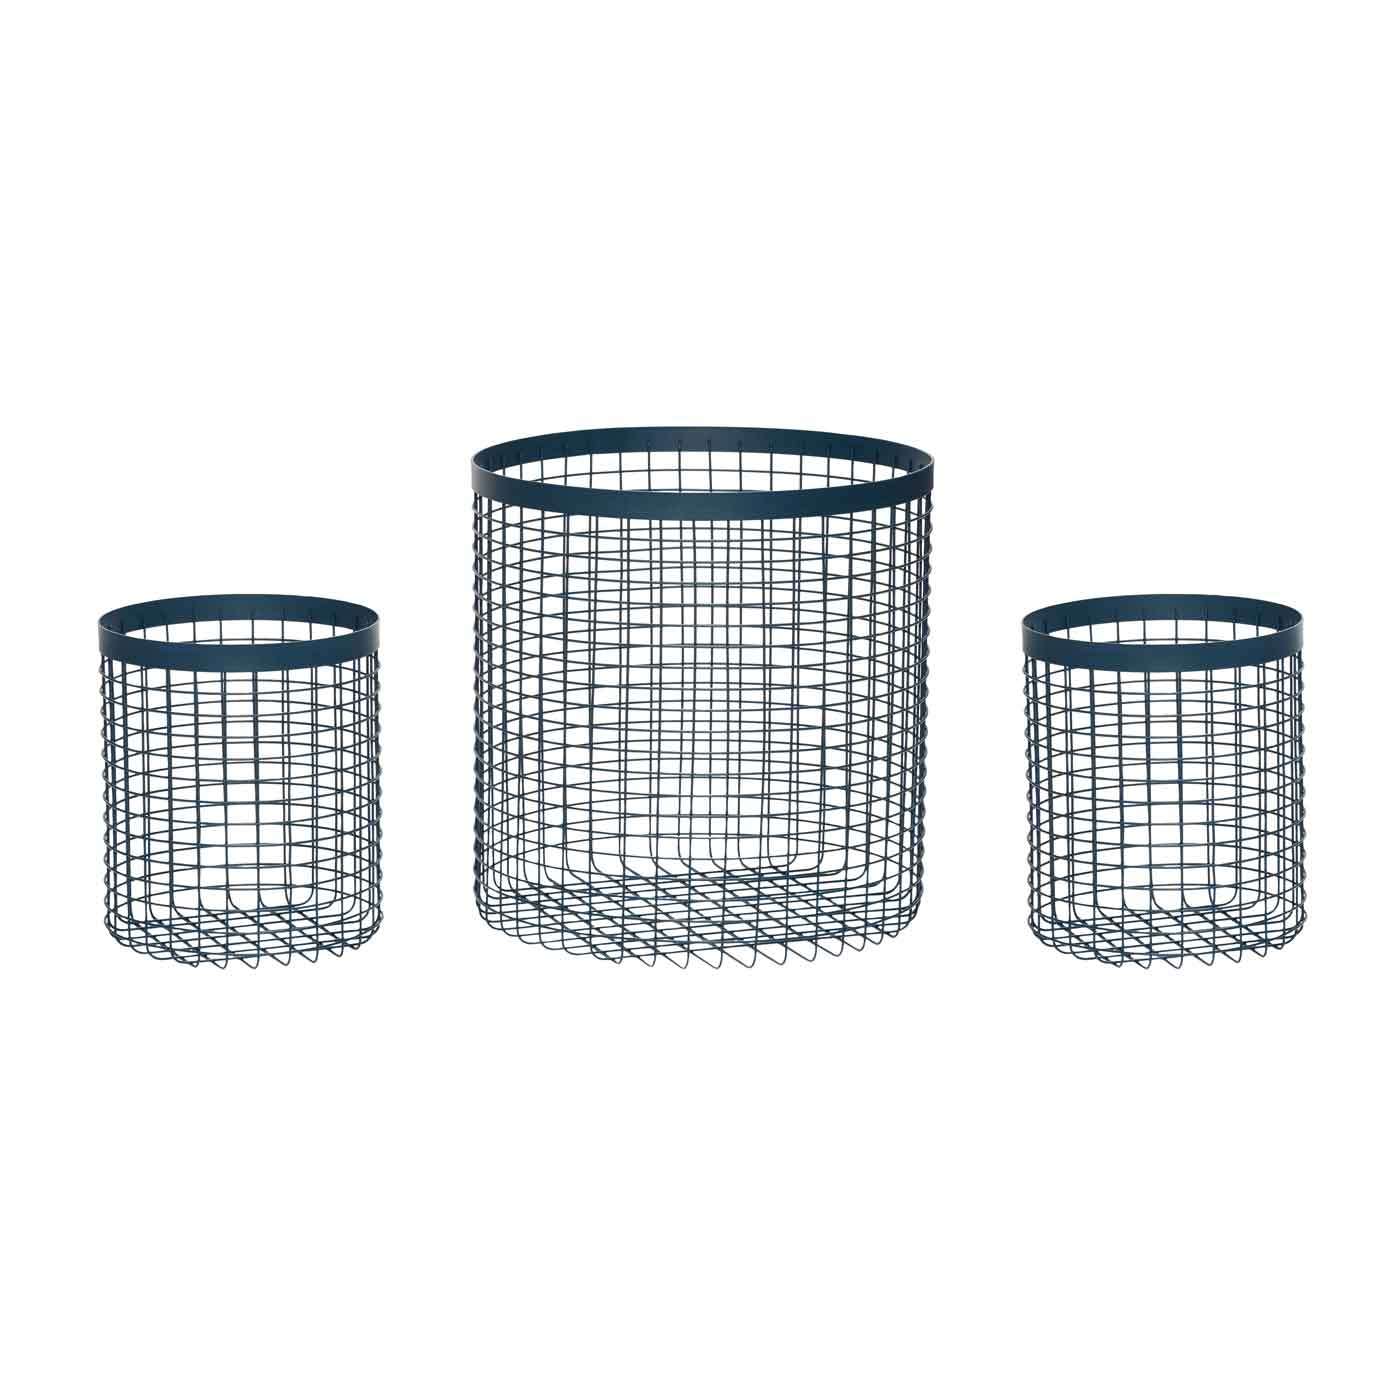 Billede af HÜBSCH Kurv - Blå metal, 3 stk, runde, , rund, metal, blå, s/3